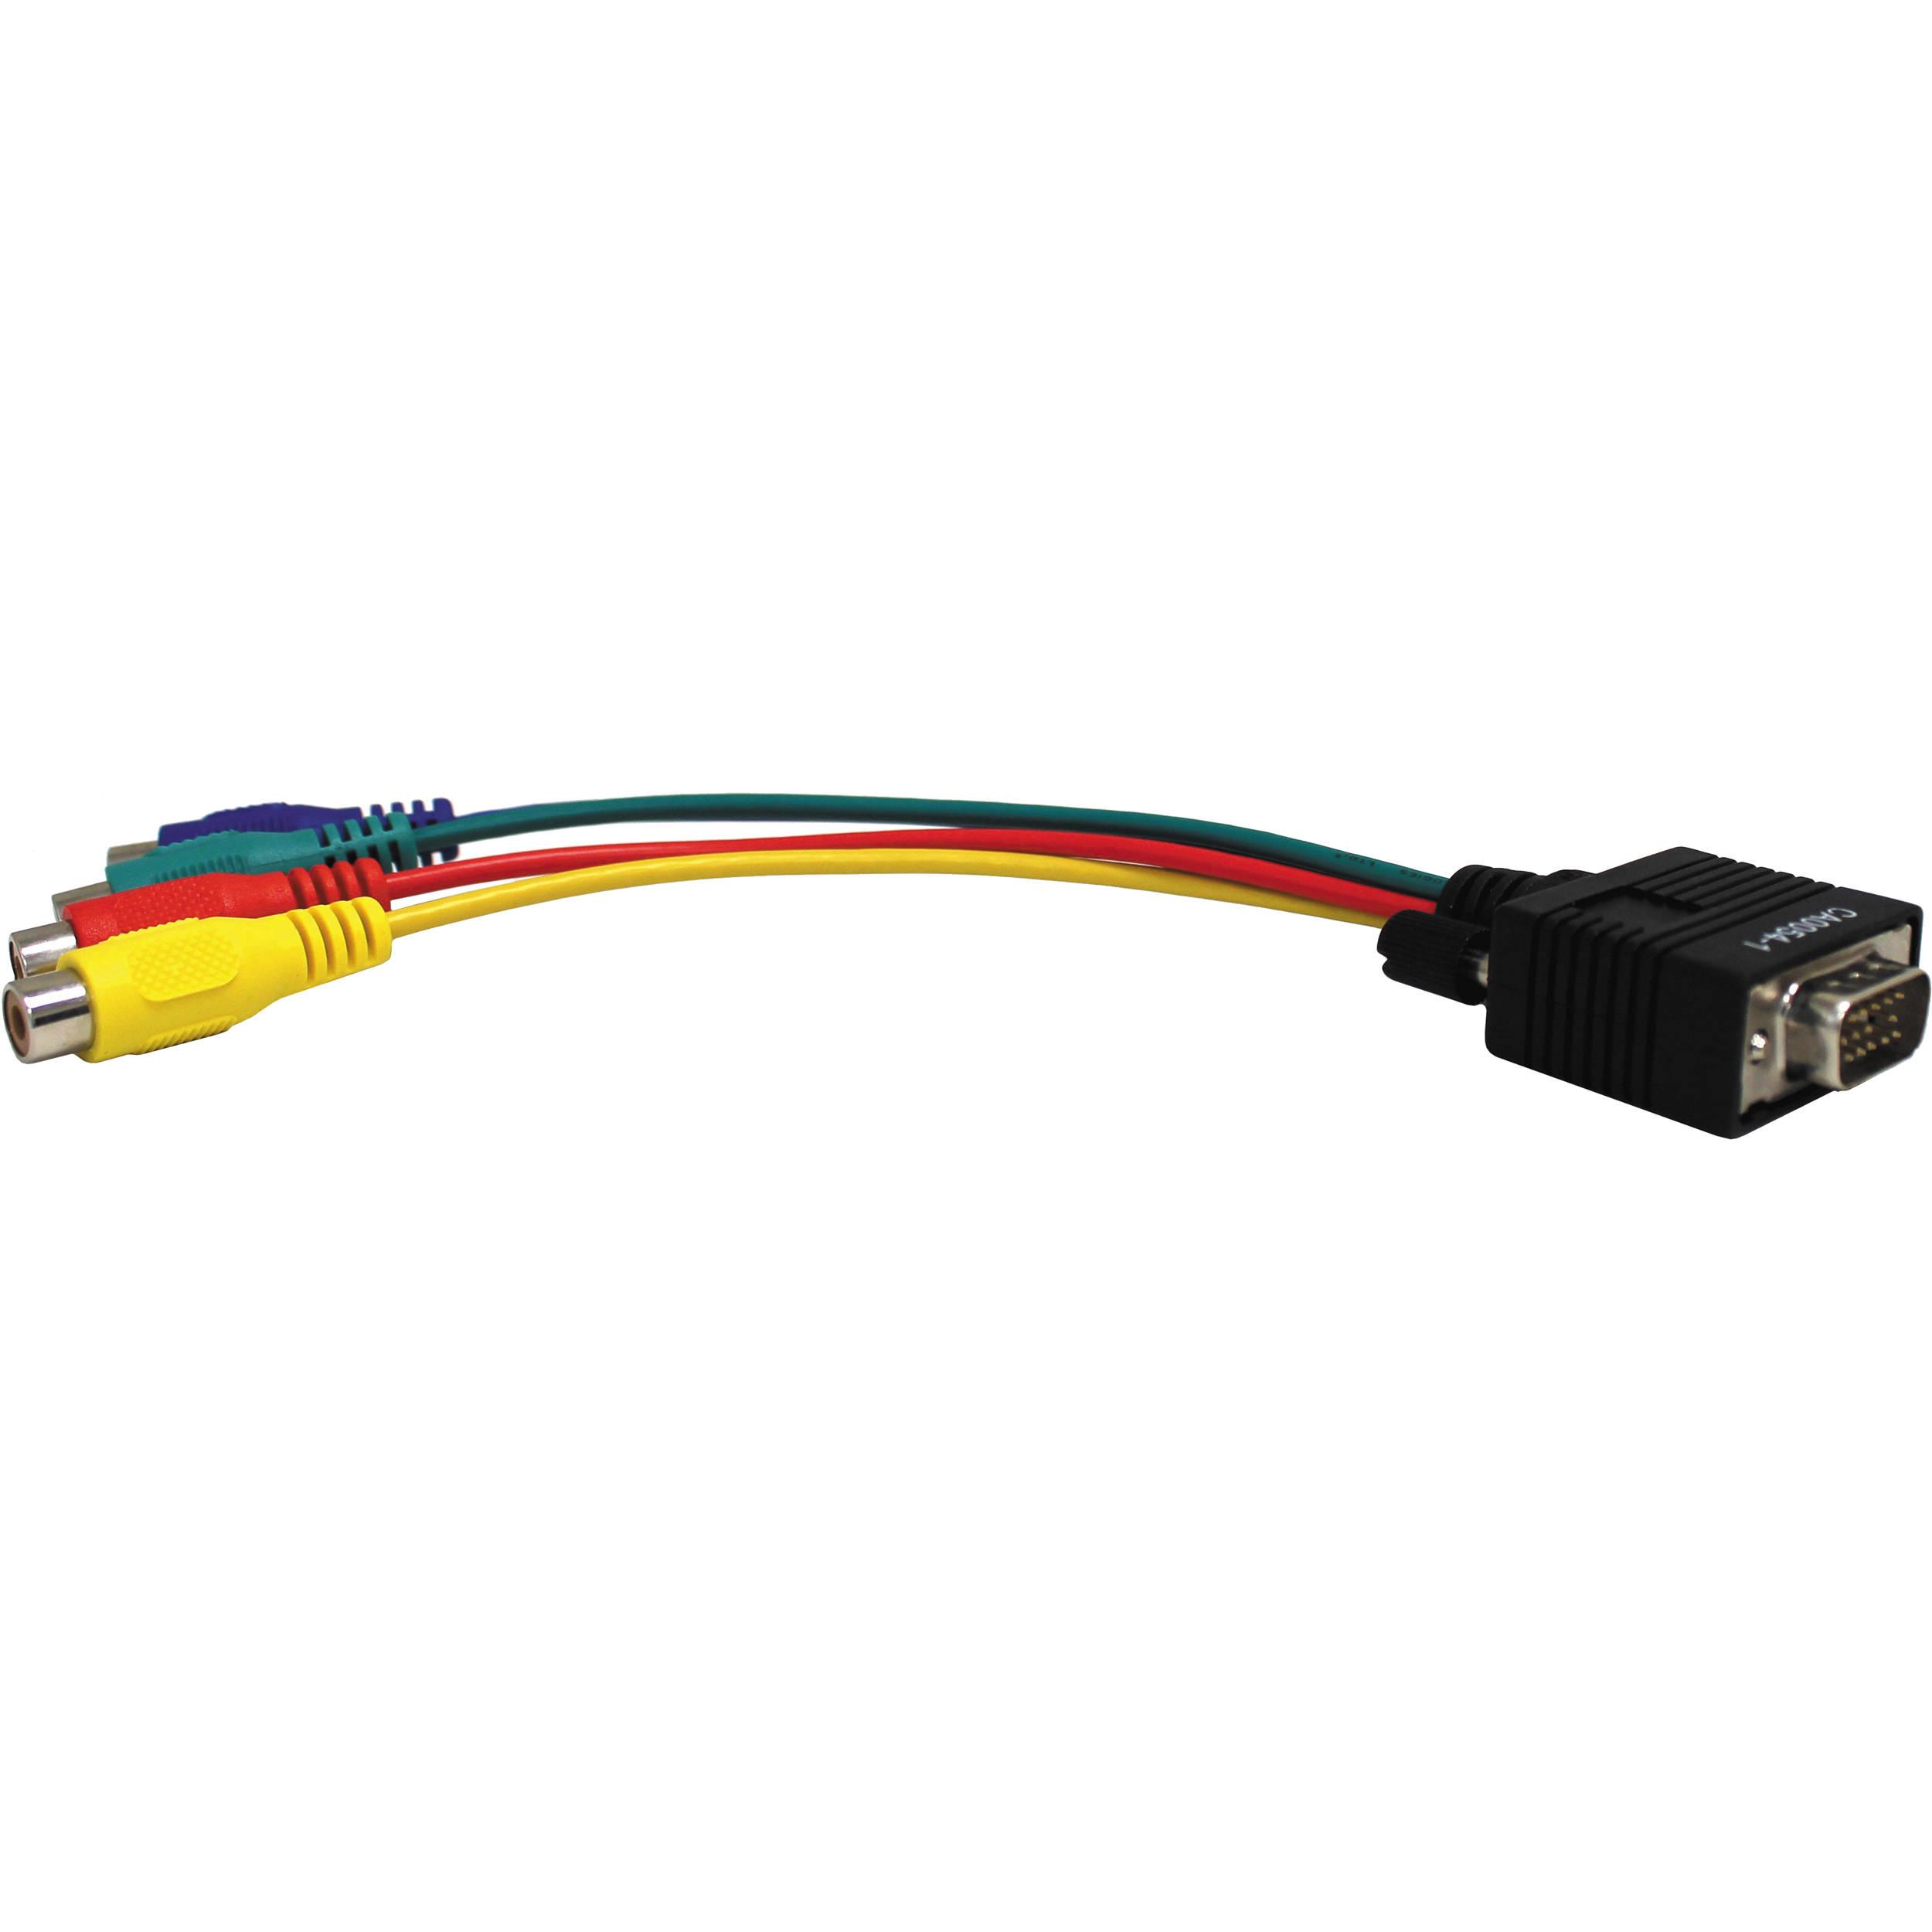 Aurora Multimedia Vga To 4 Rca Adaptor Cable 8 Ca0054 1 Circuit